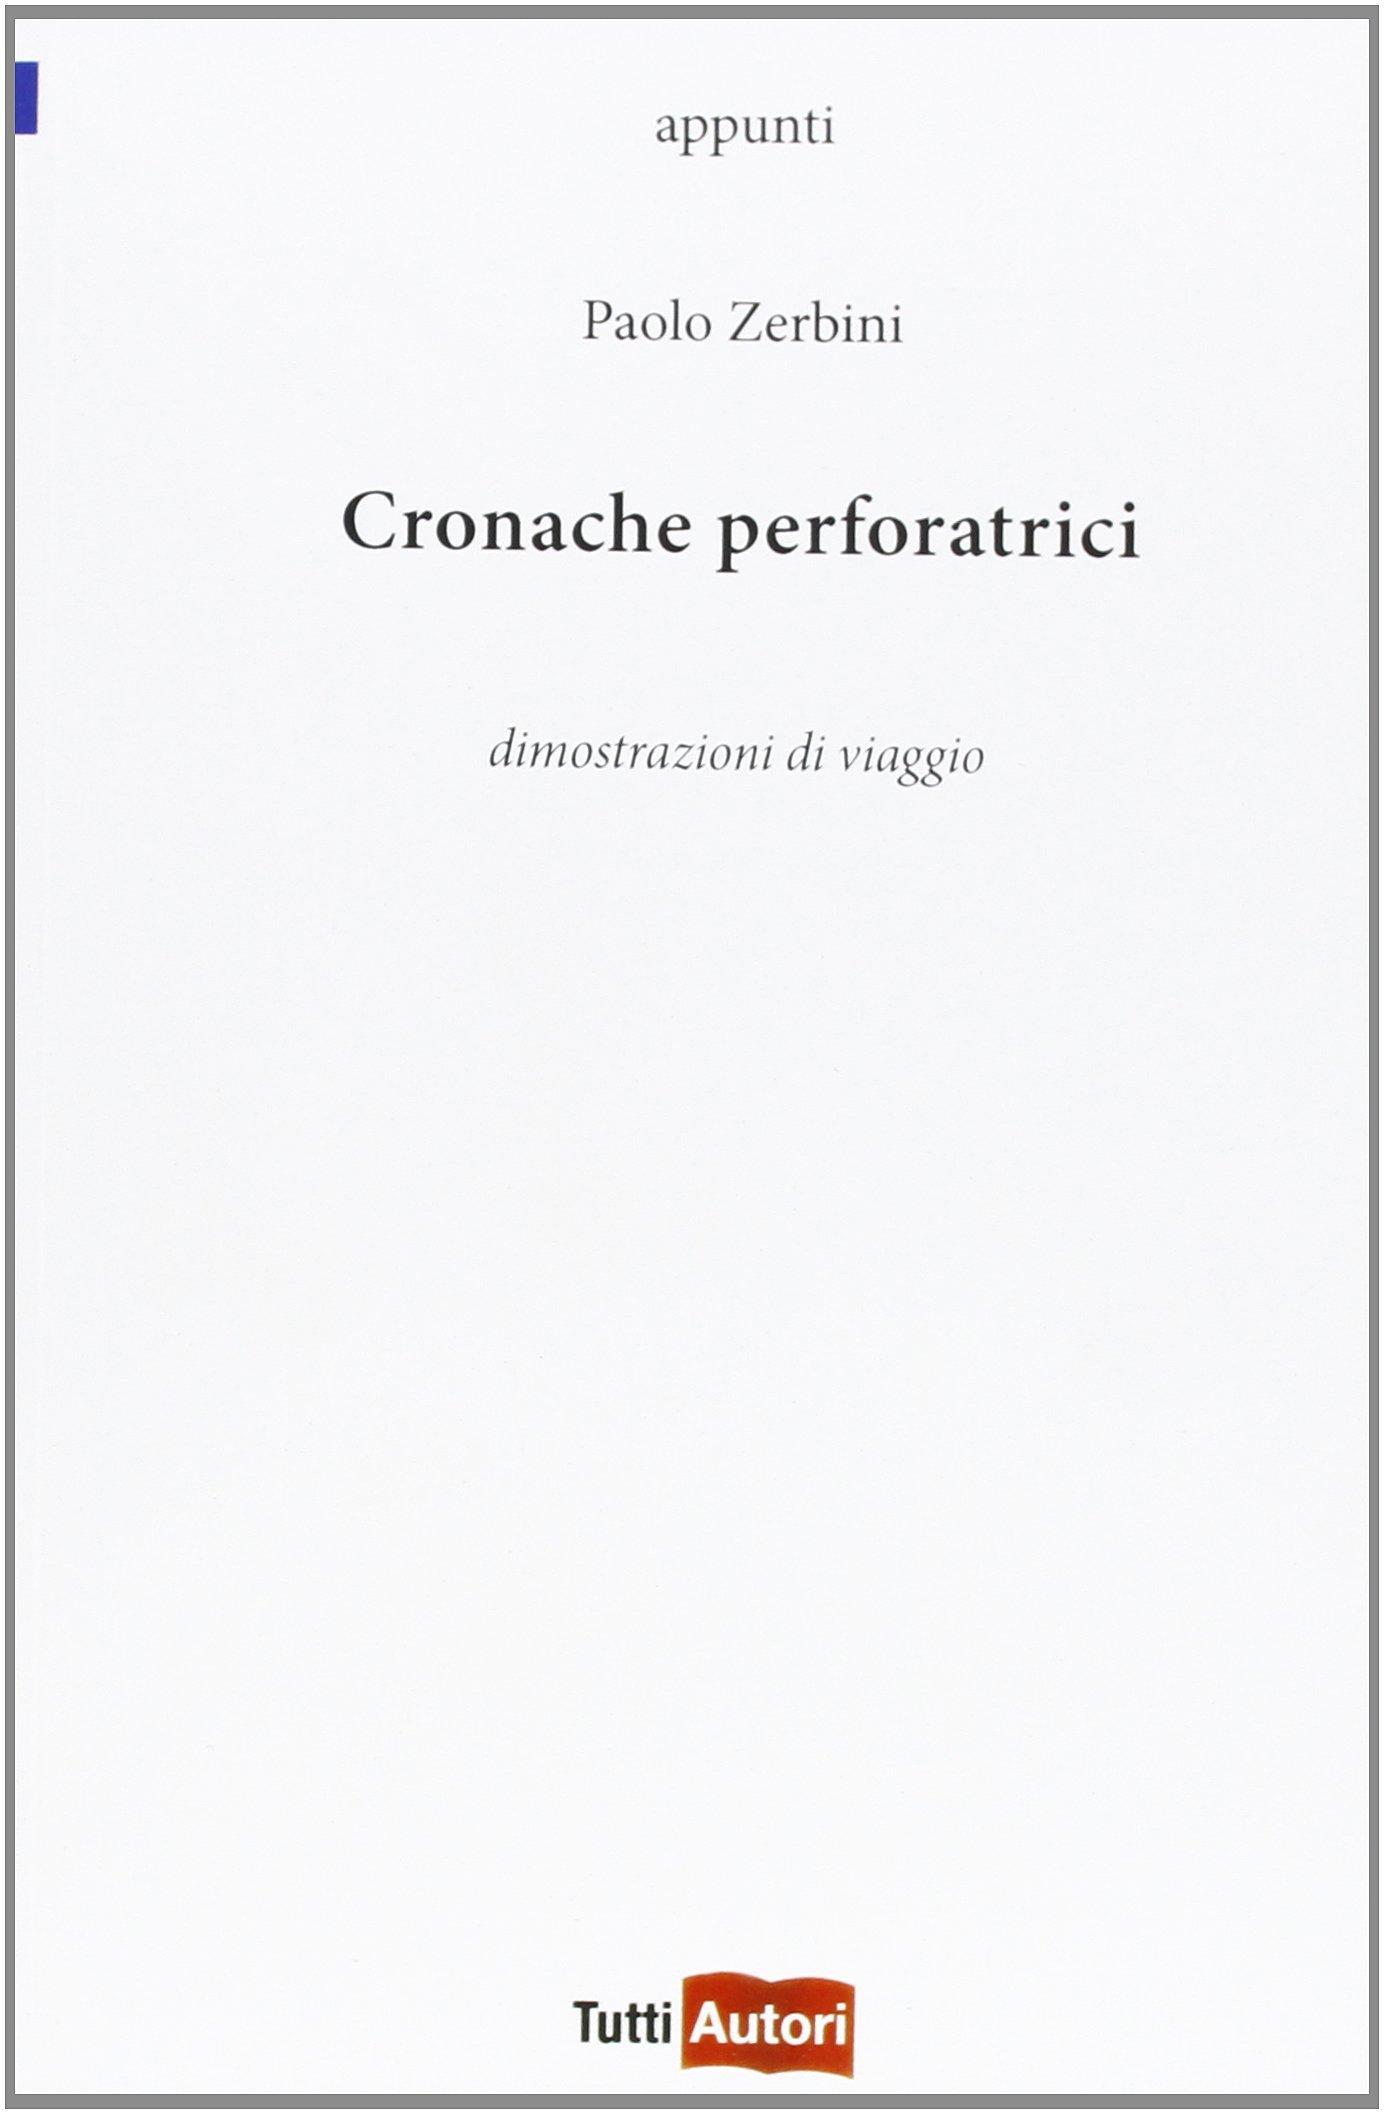 Cronache Perforatrici - Copertina